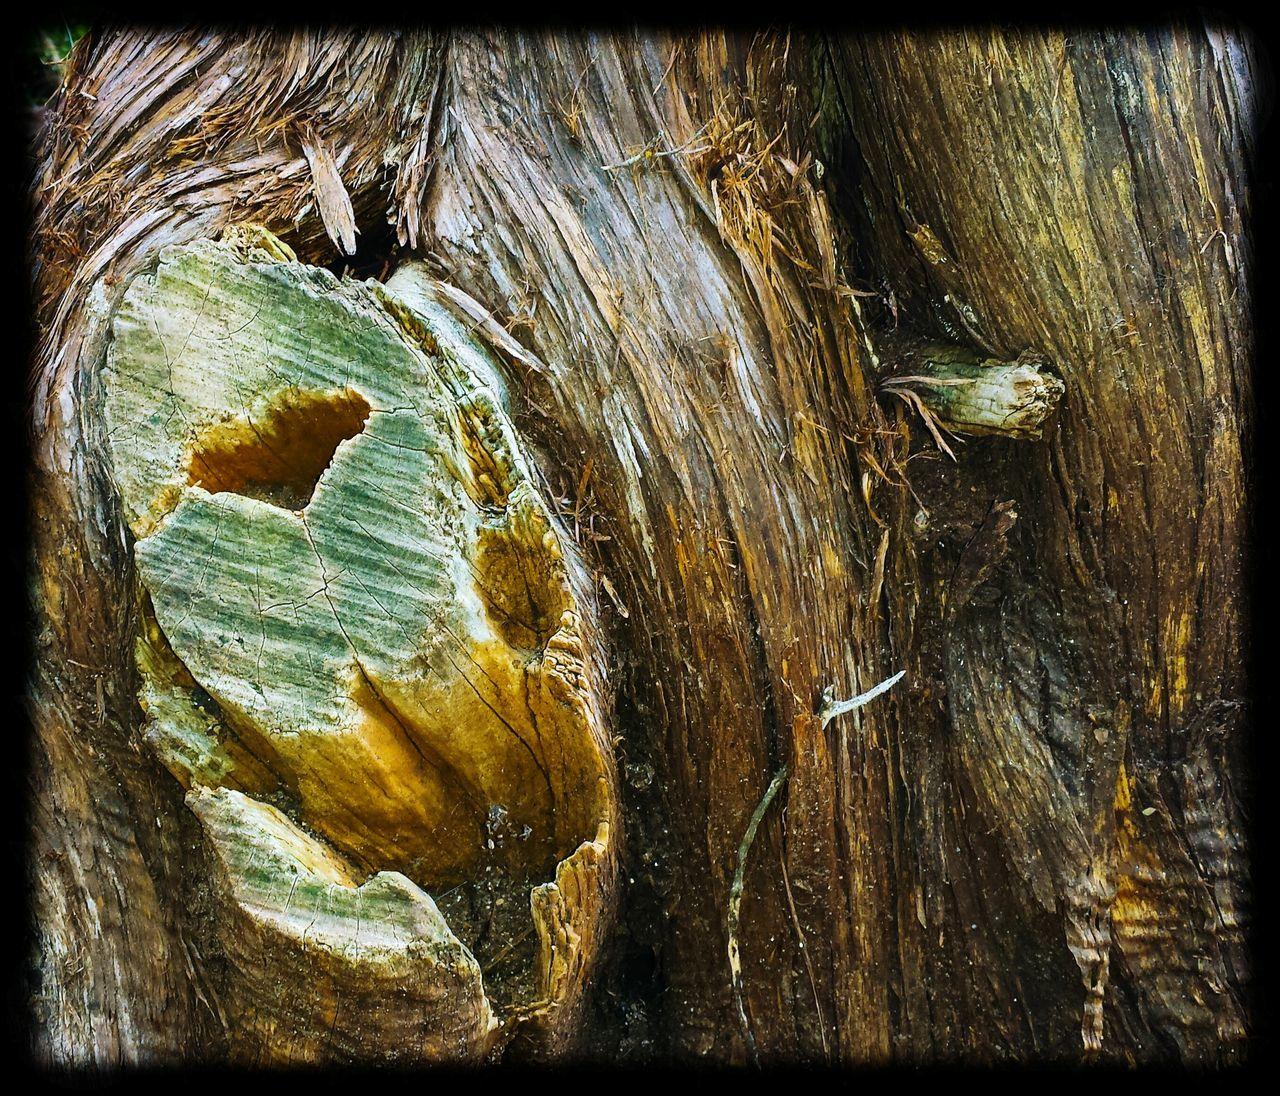 Eye Em Nature Lover Greenbelt Austin TX